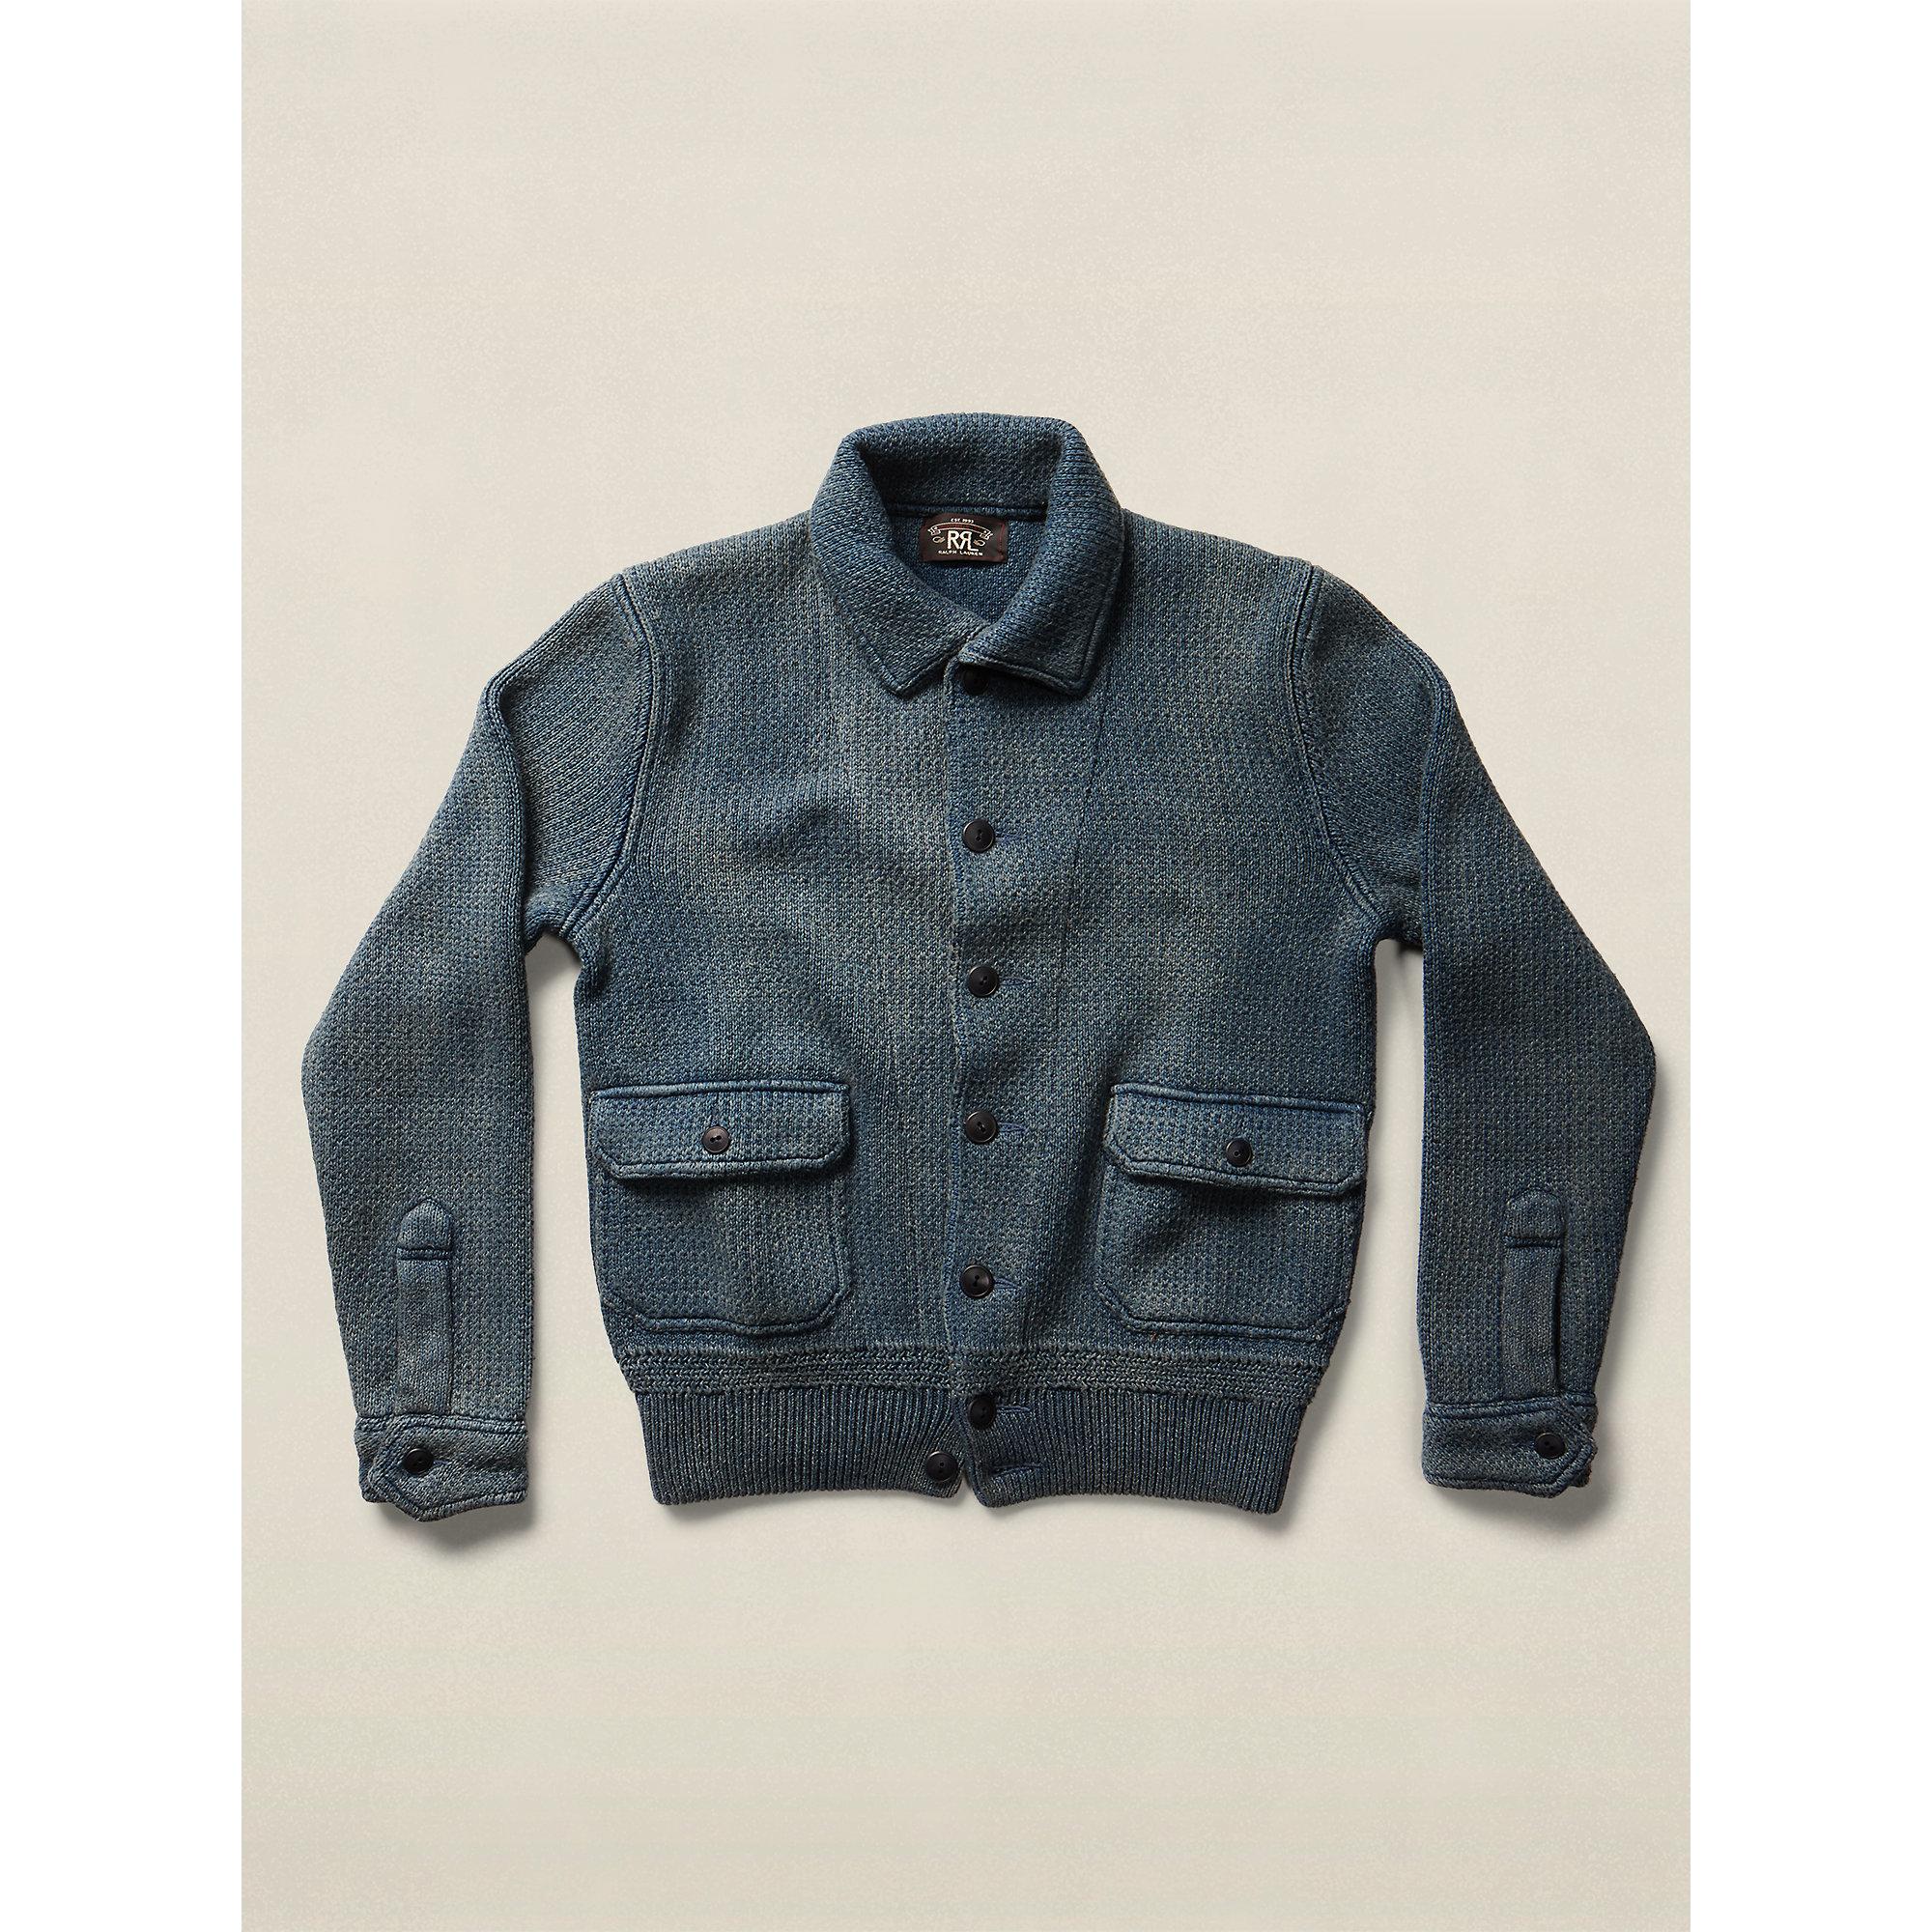 Rrl Indigo Cotton Sweater Jacket In Blue For Men Lyst